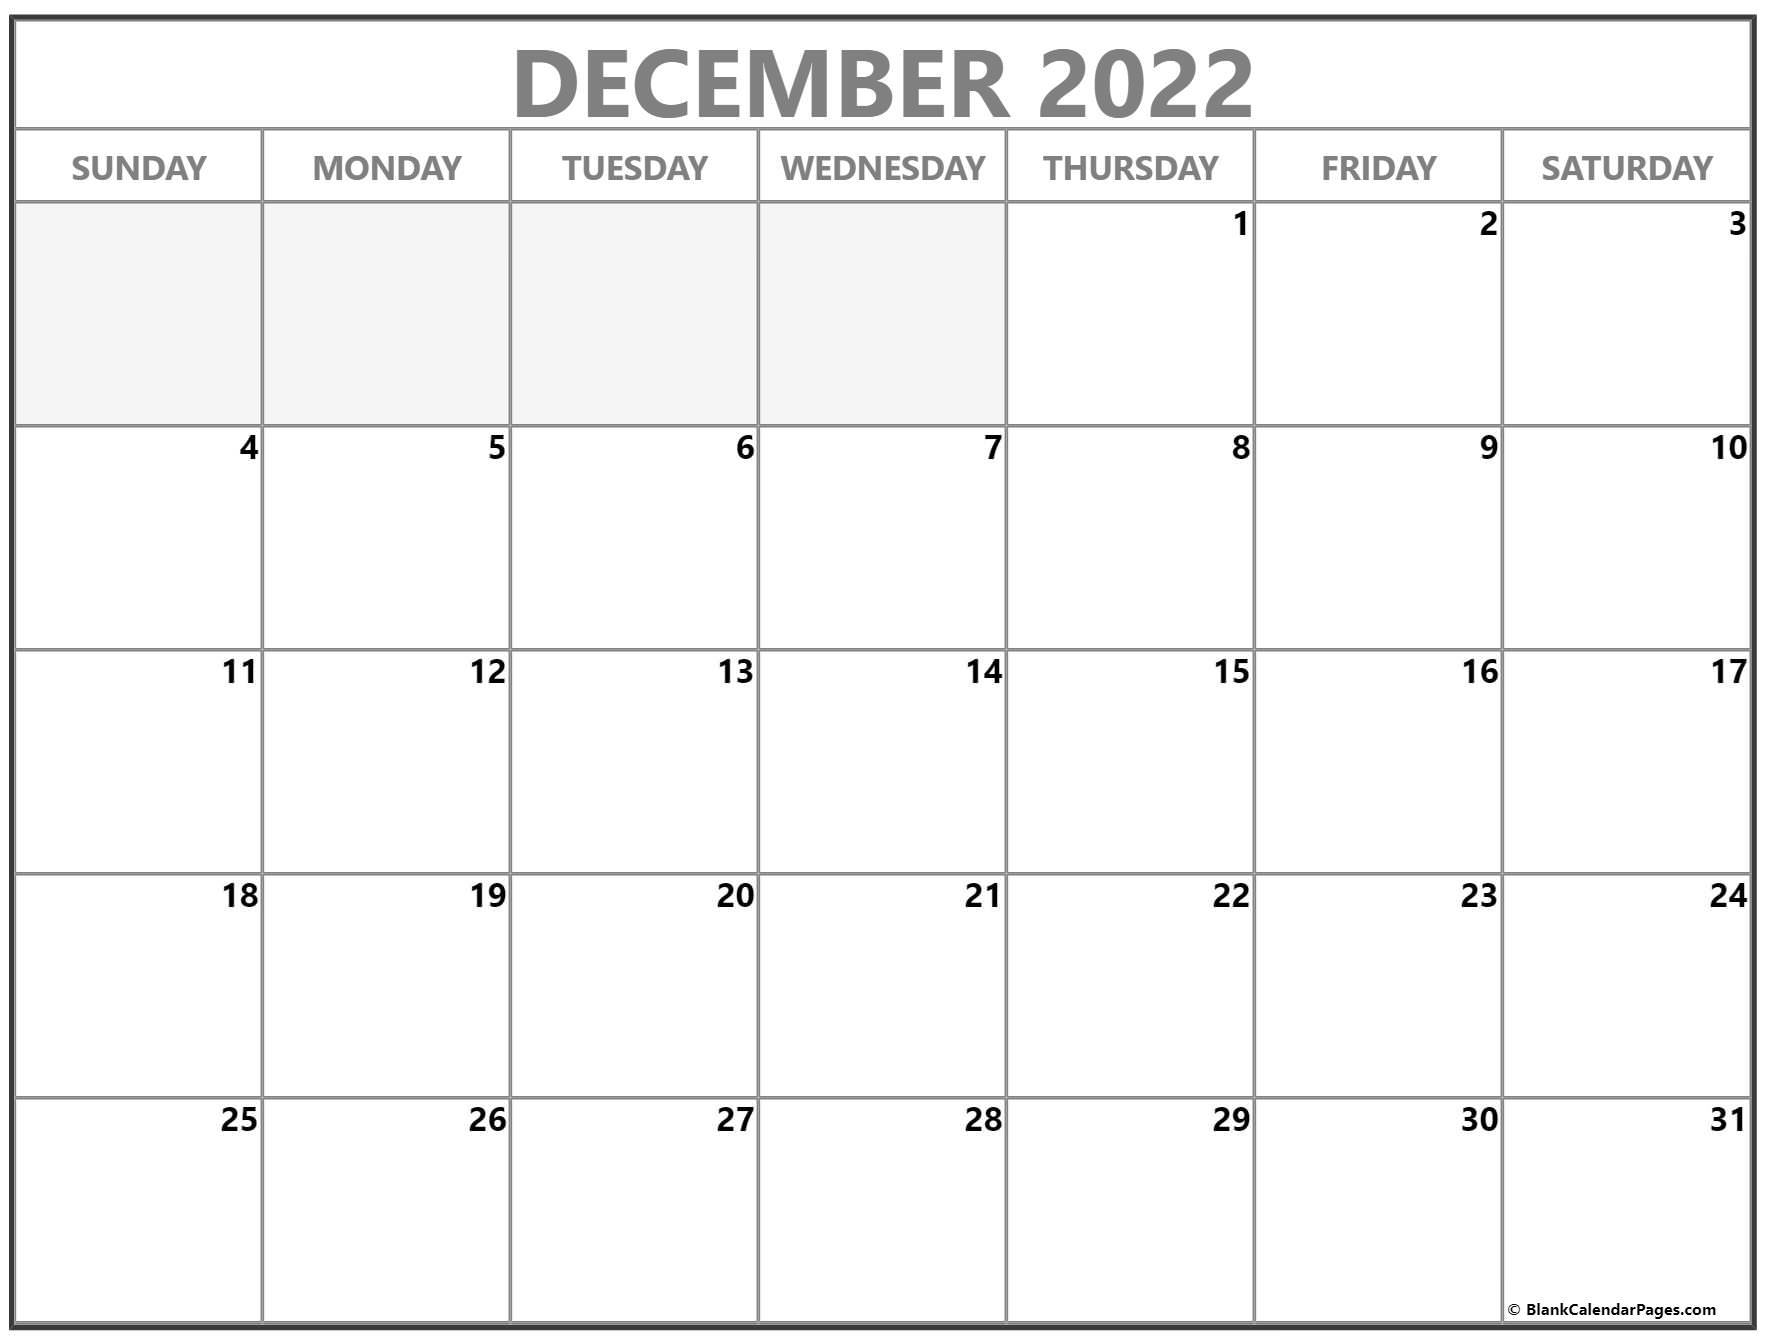 Blank calendar for the year 2022. December 2022 calendar   free printable calendar templates